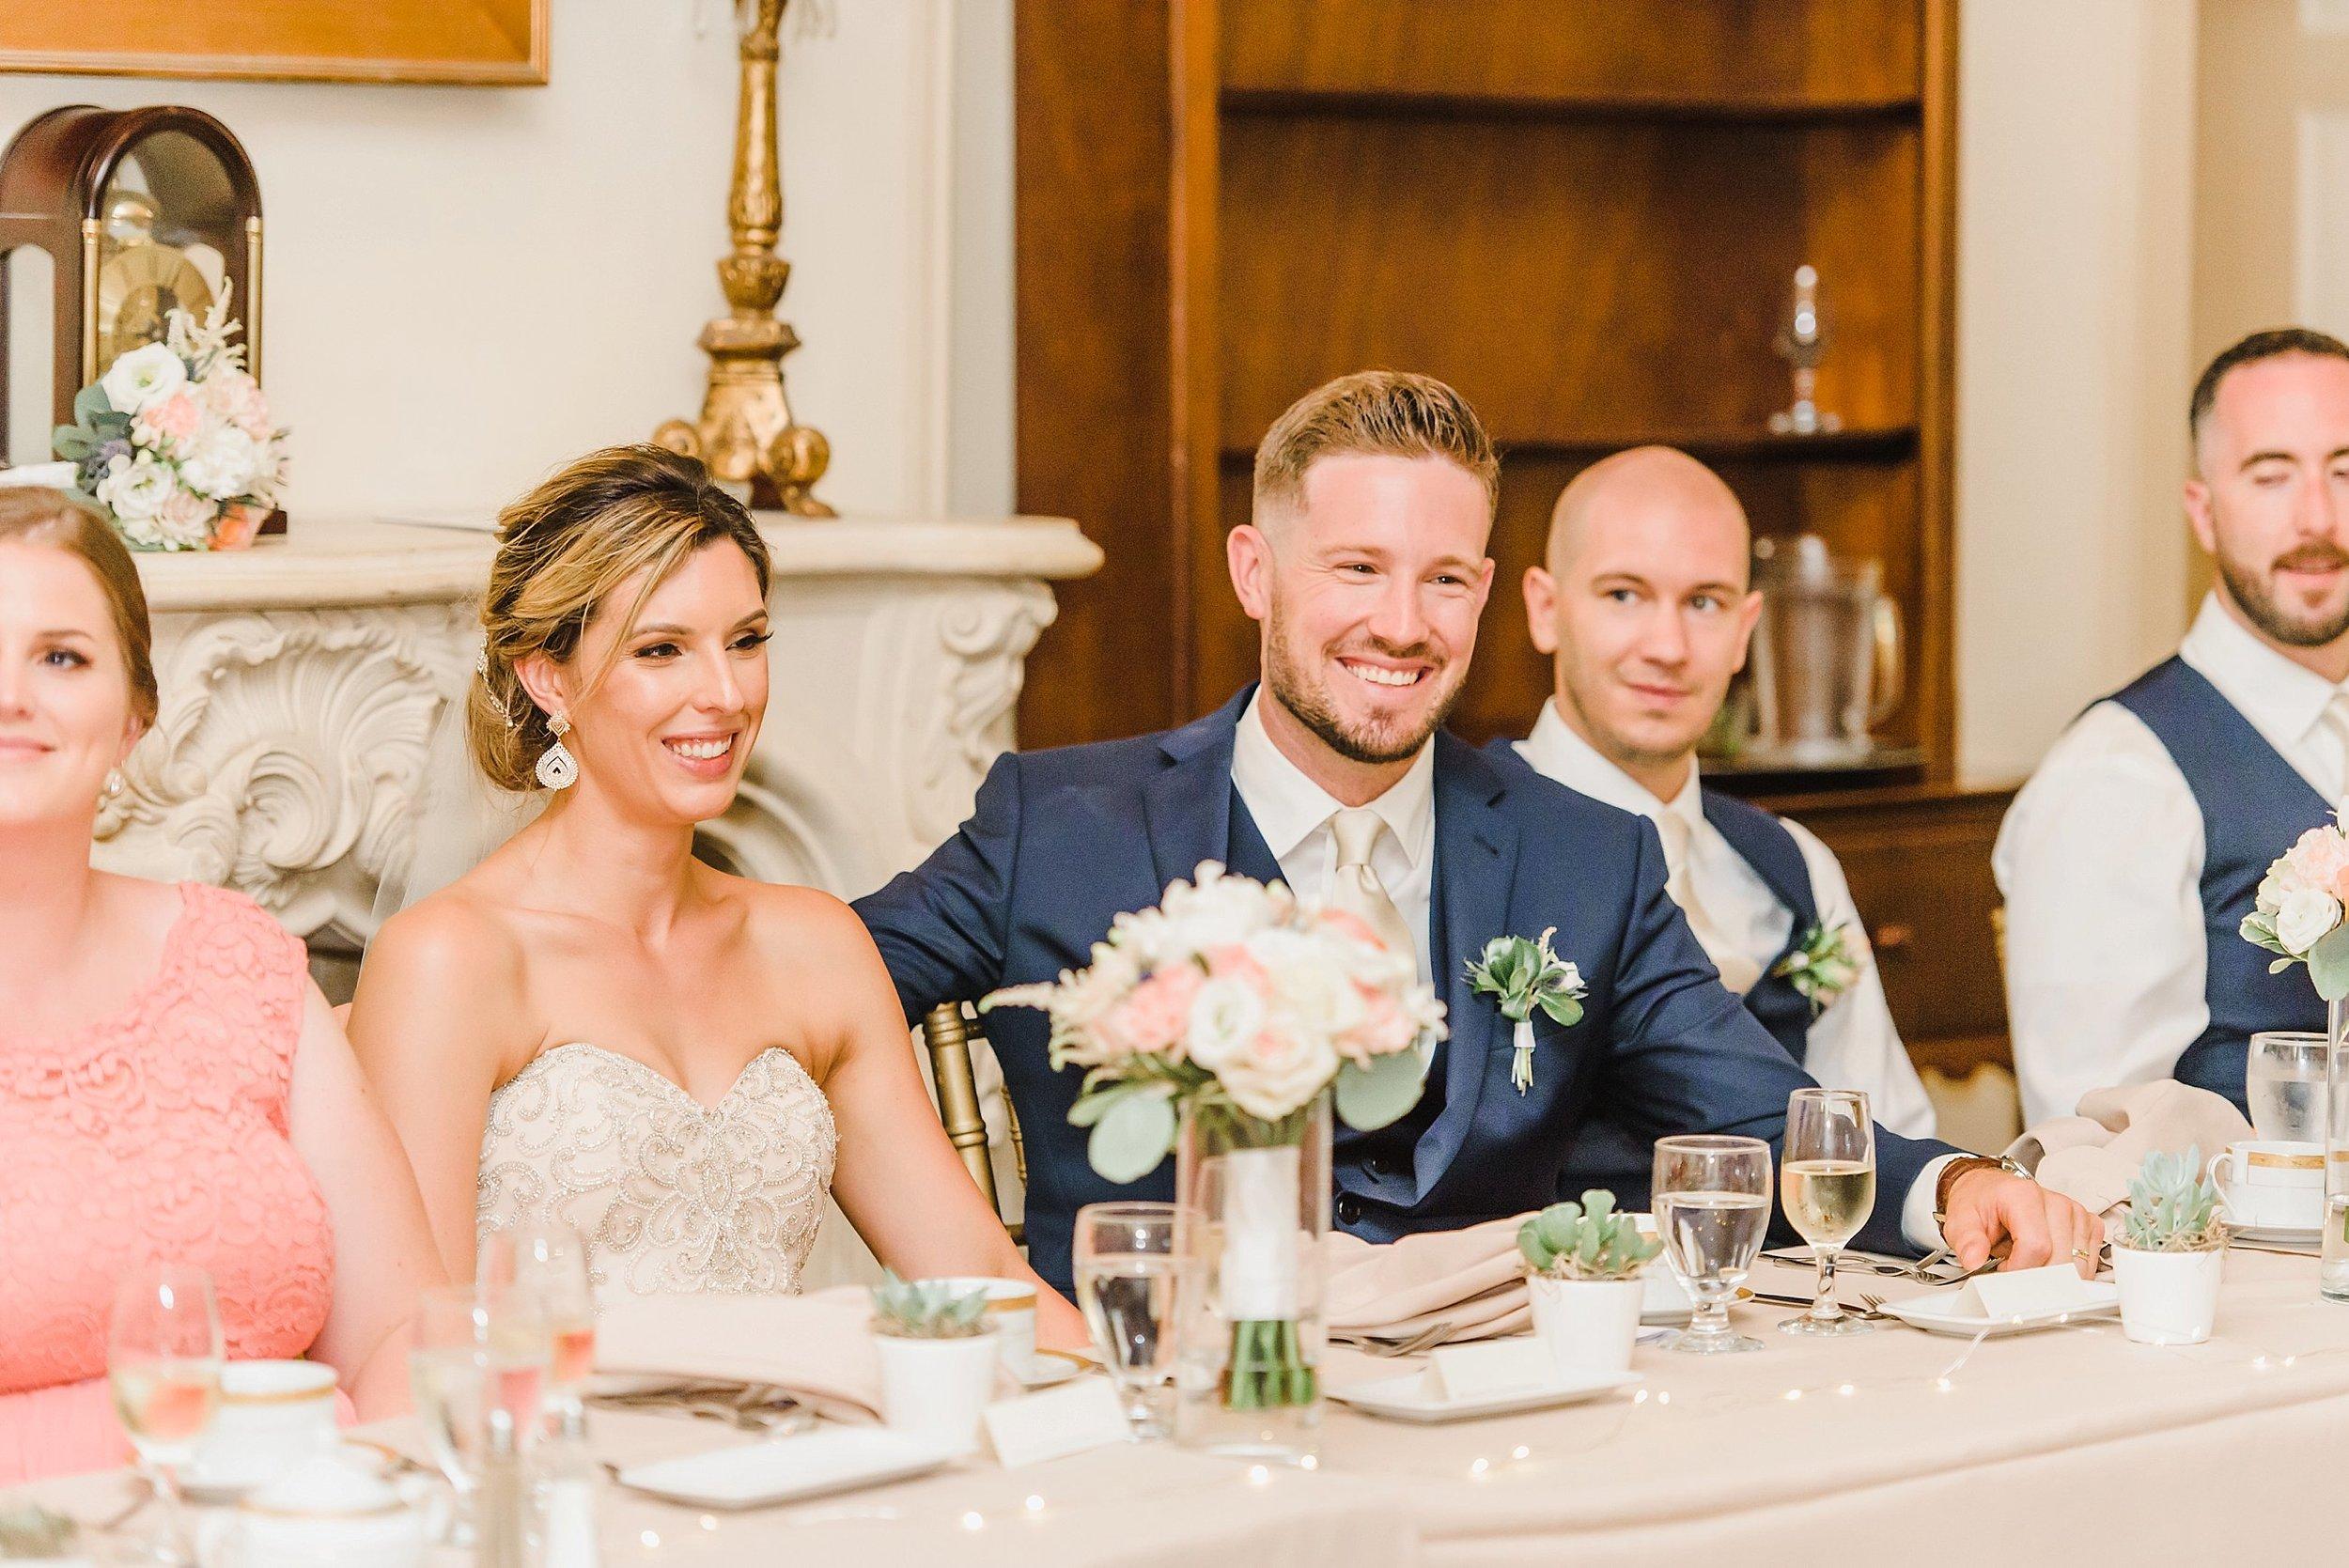 light airy indie fine art ottawa wedding photographer | Ali and Batoul Photography_0215.jpg